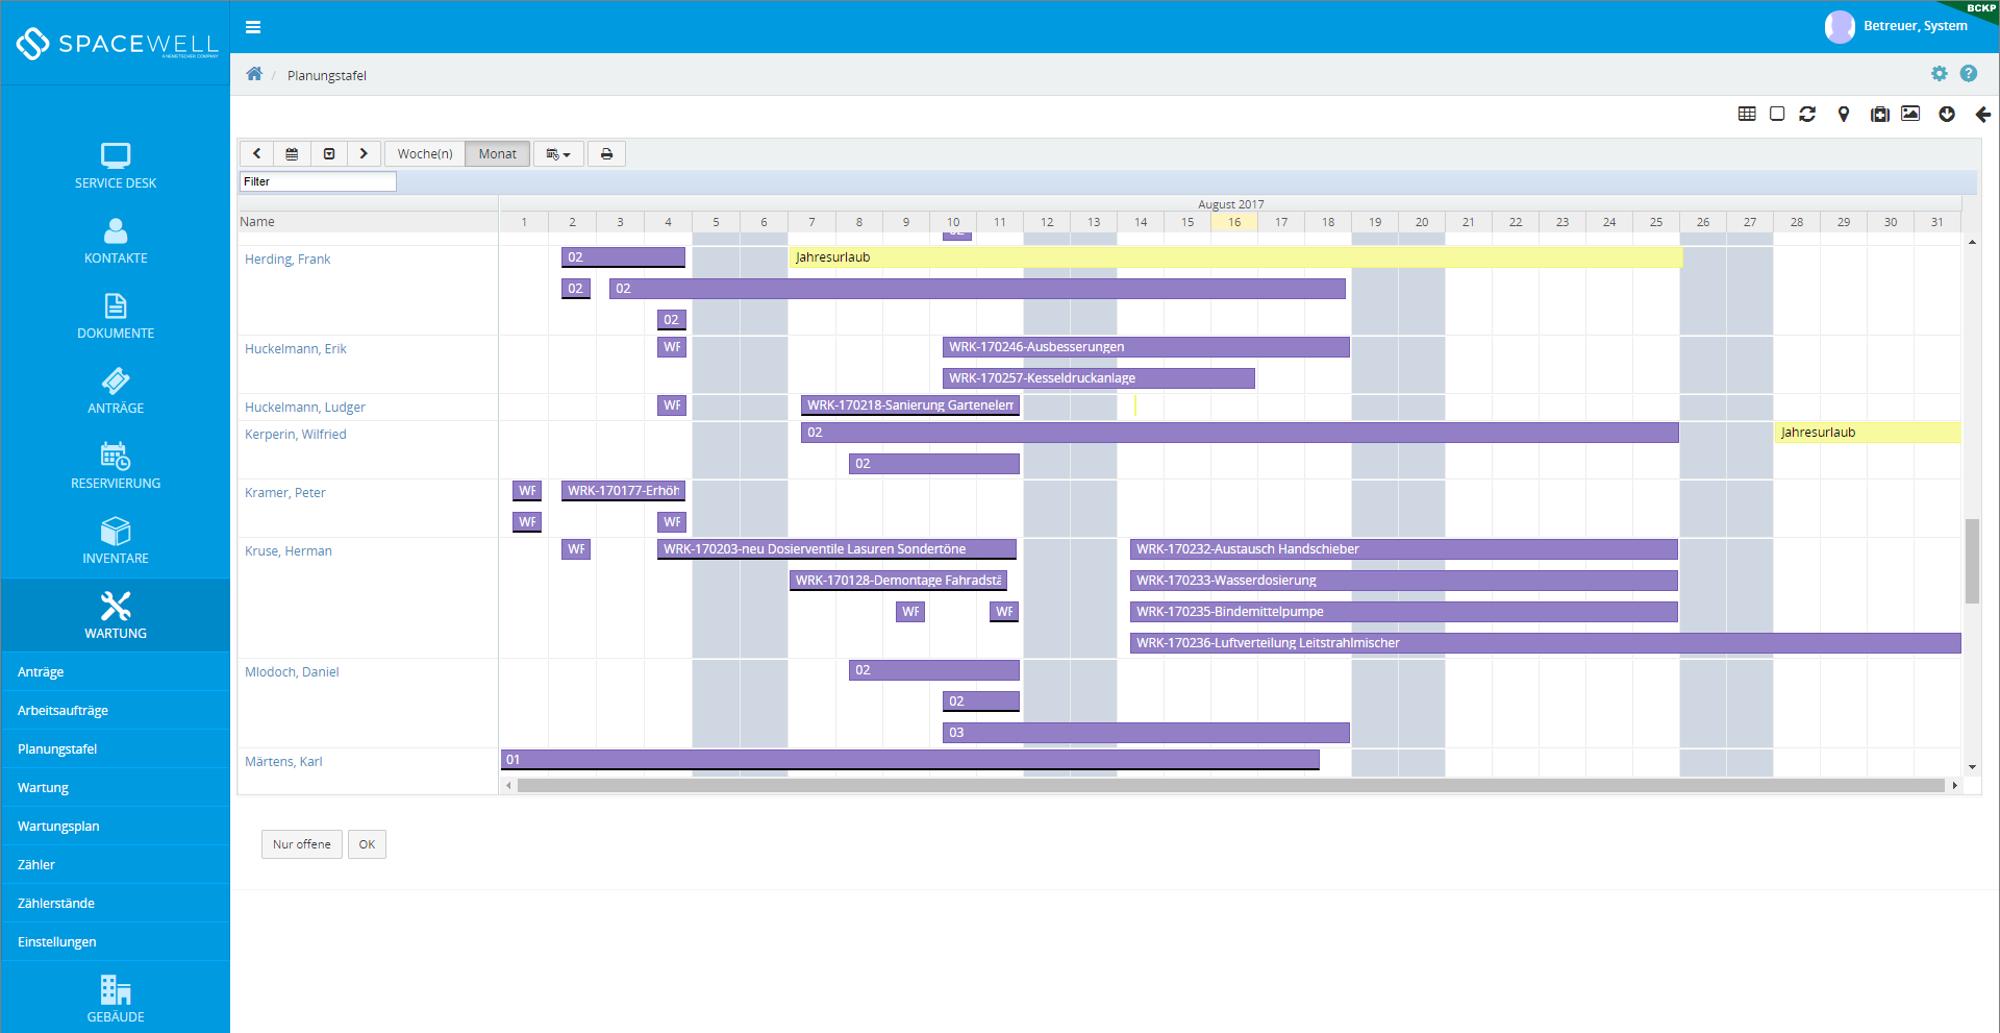 Planung der Instandhaltung mit der Asset Management Software